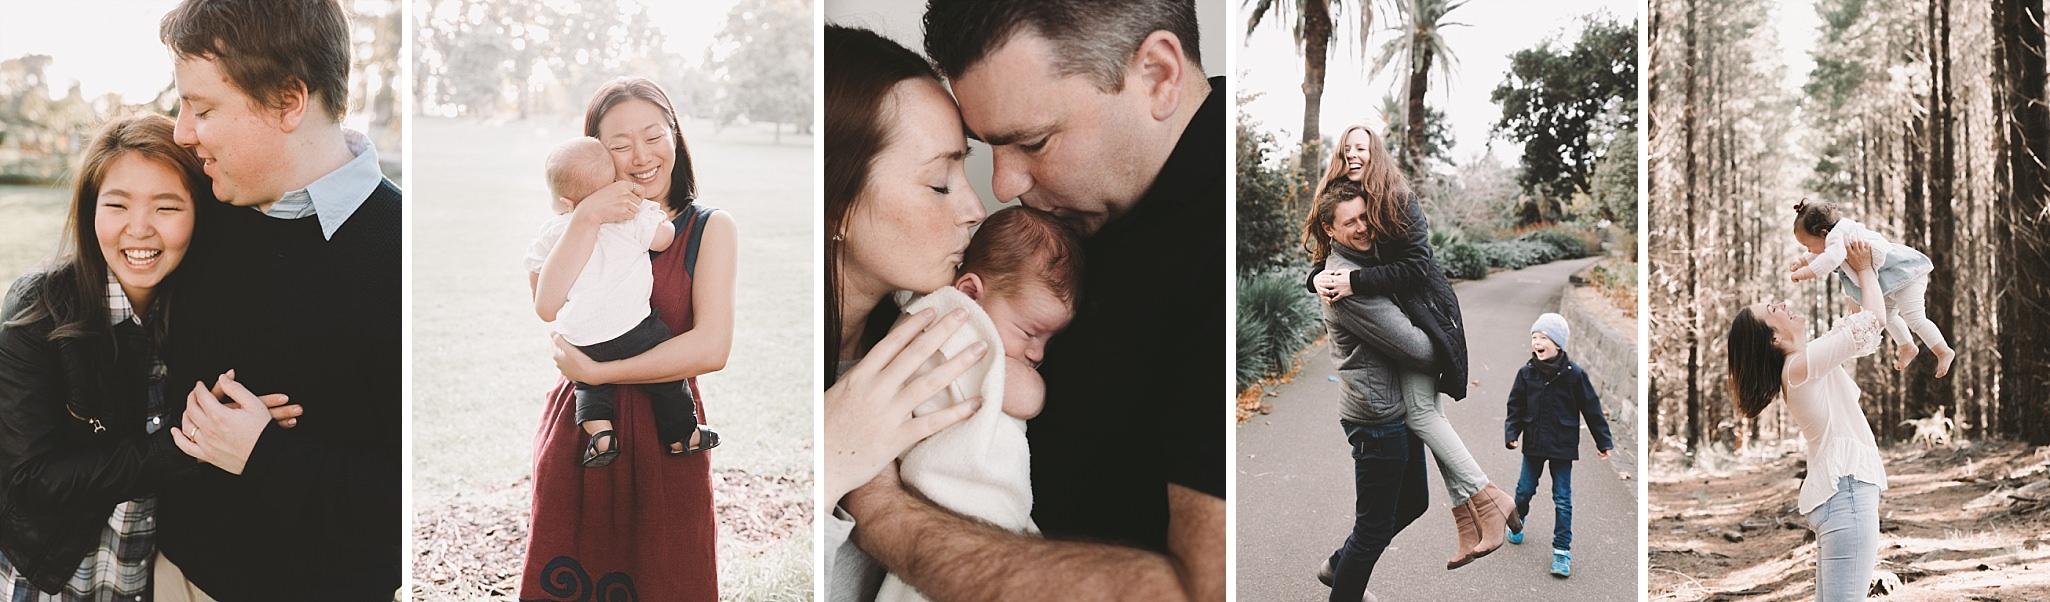 Lecinda Ward, Melbourne Family Newborn and Wedding Photographer_0091.jpg